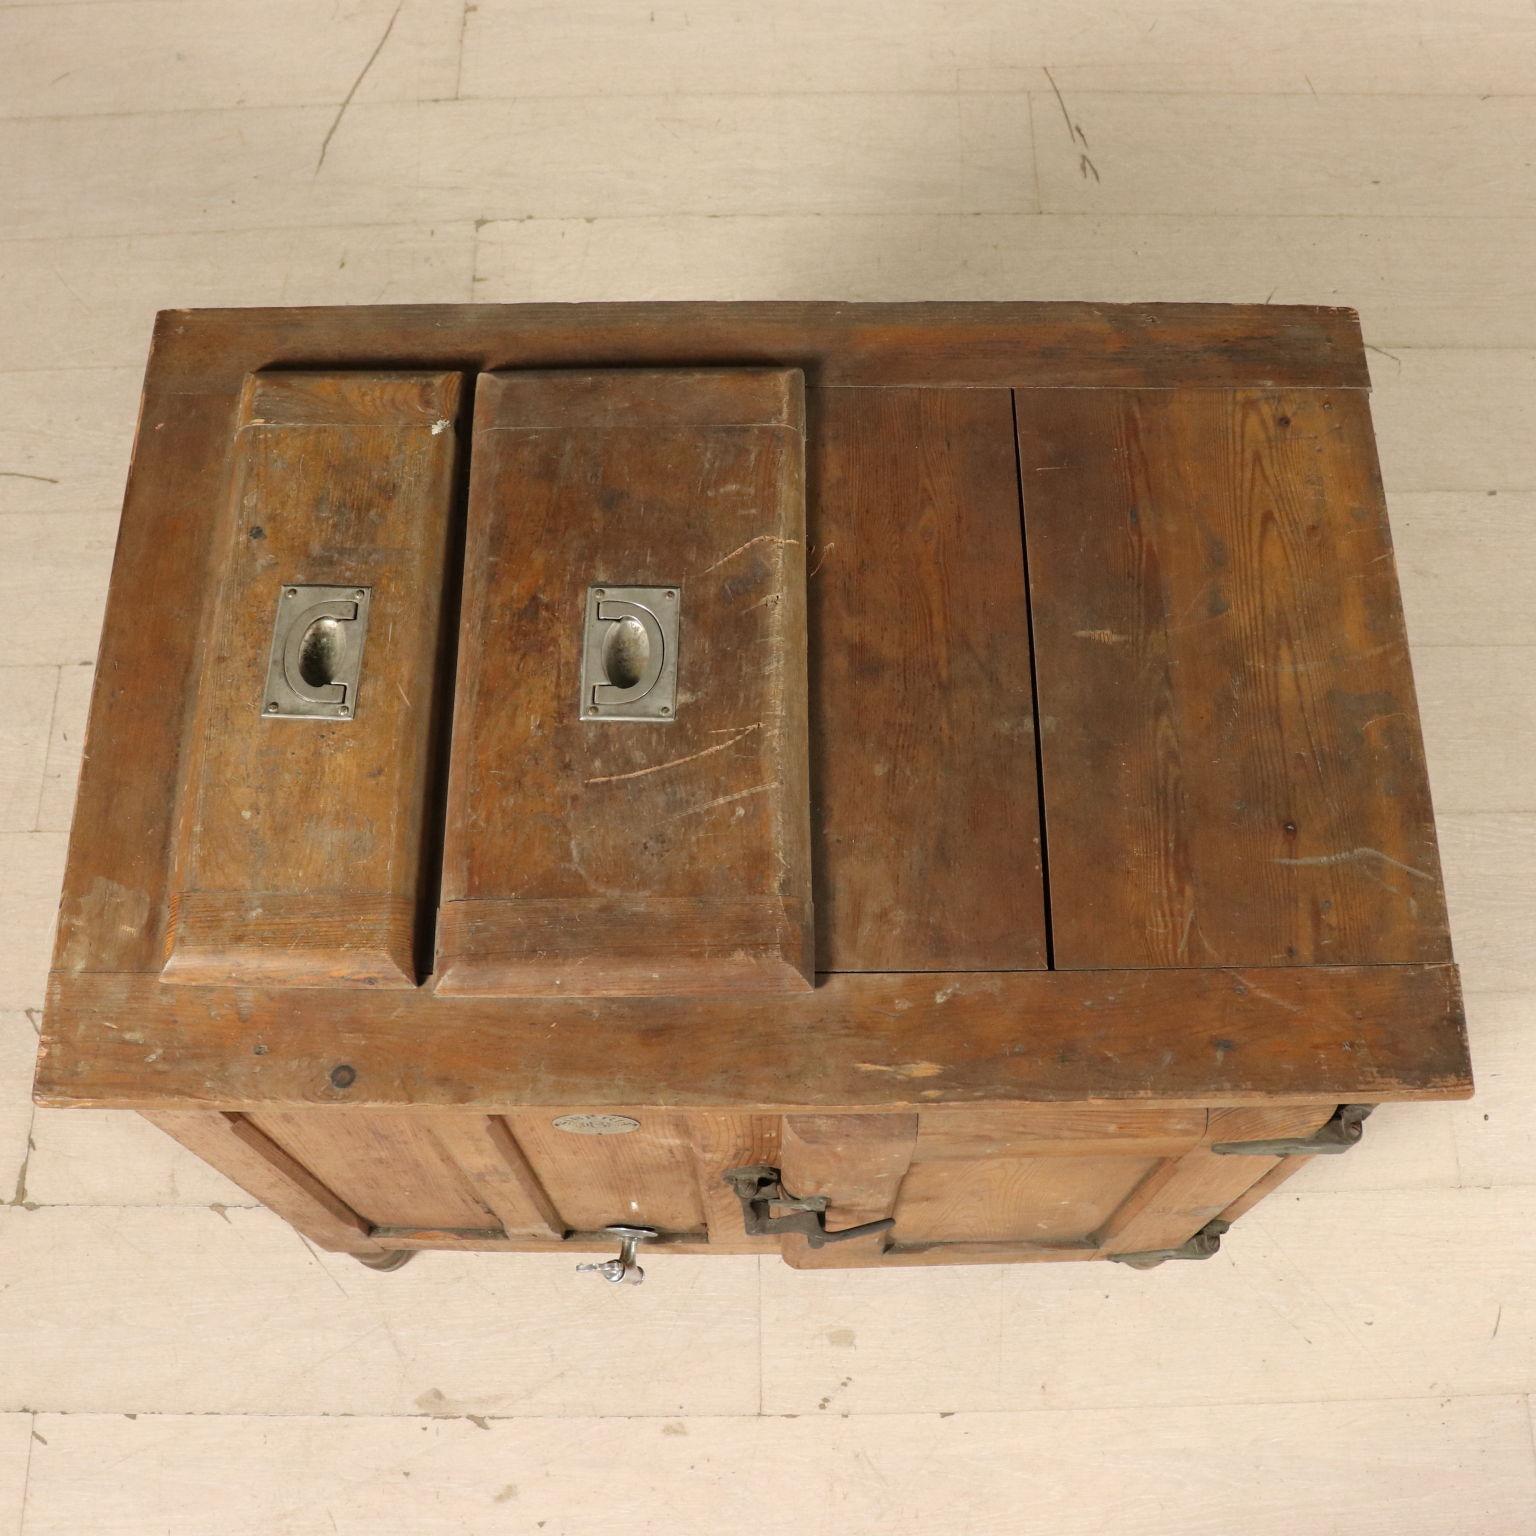 Ghiacciaia Siberia - Altri mobili - Antiquariato ...